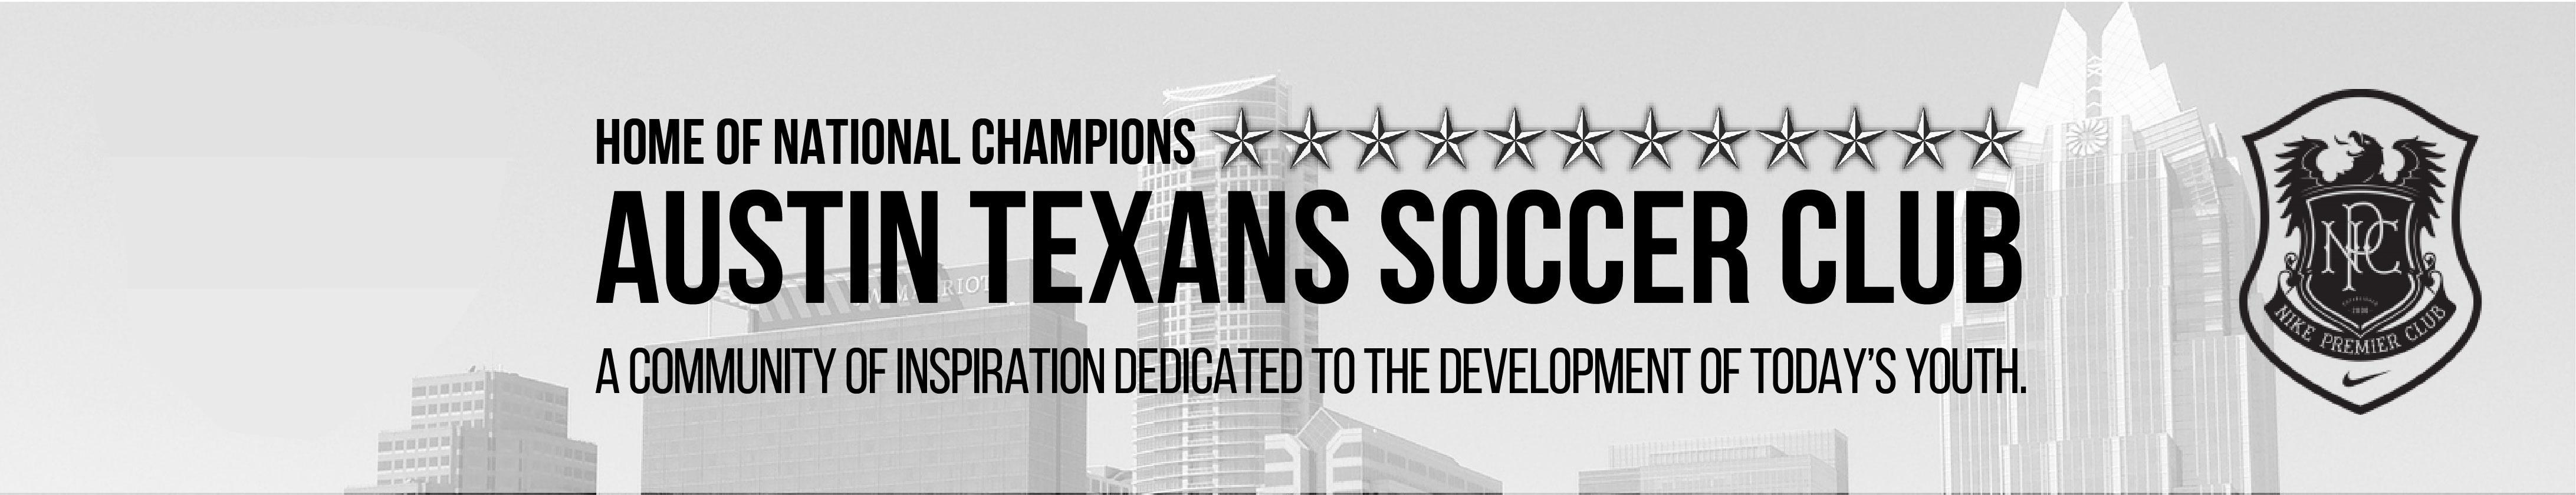 2020 austin texans web banner sting